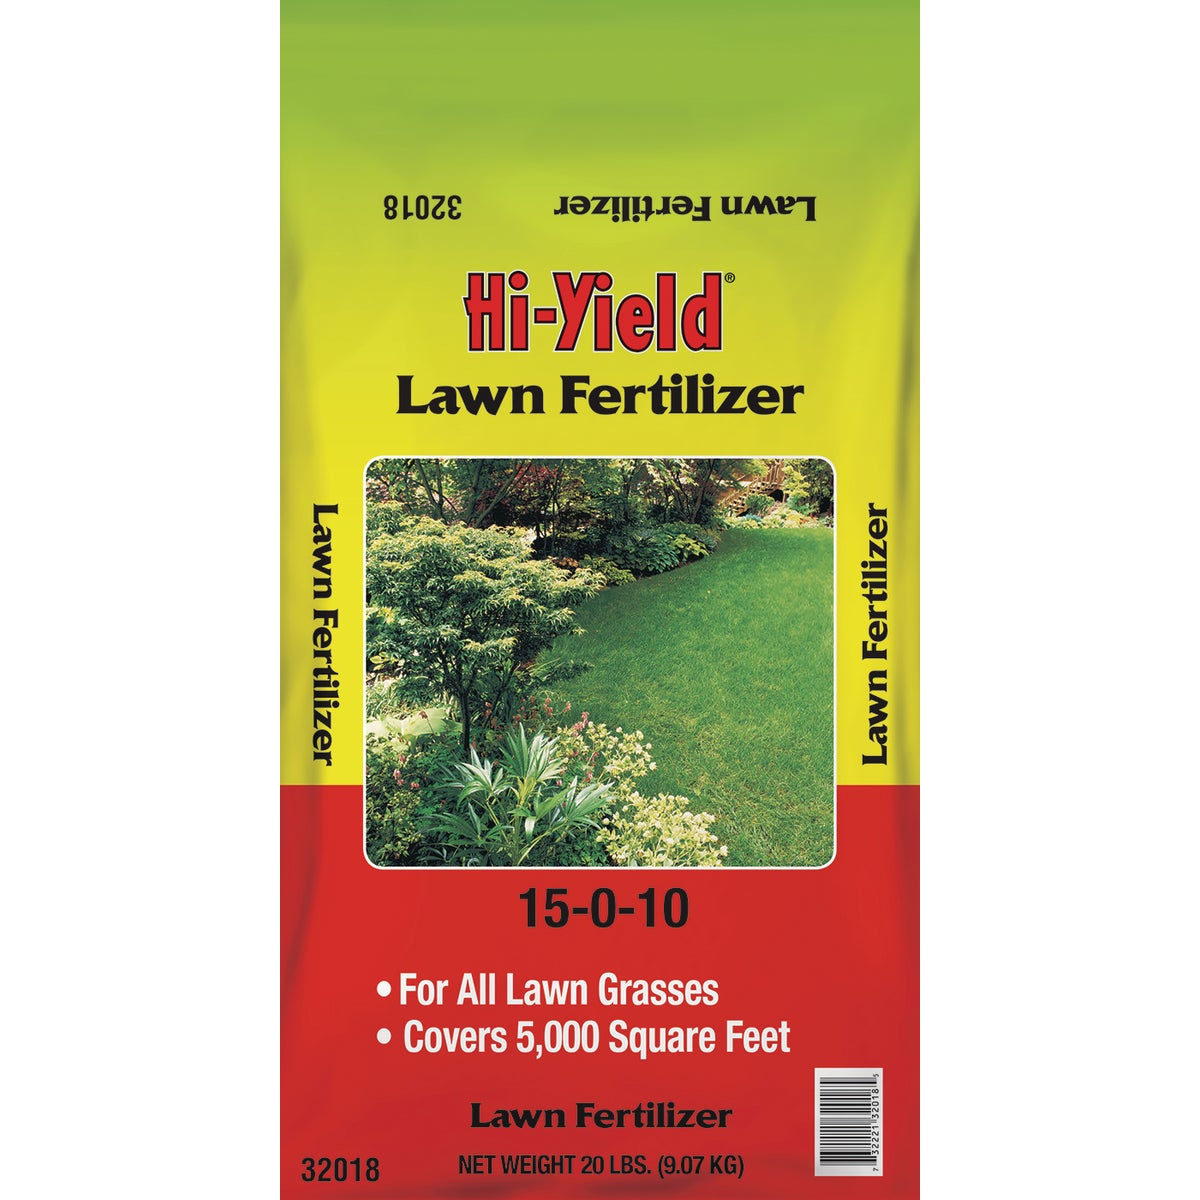 20LB LAWN FERTILIZER - 32018 by Vpg Fertilome